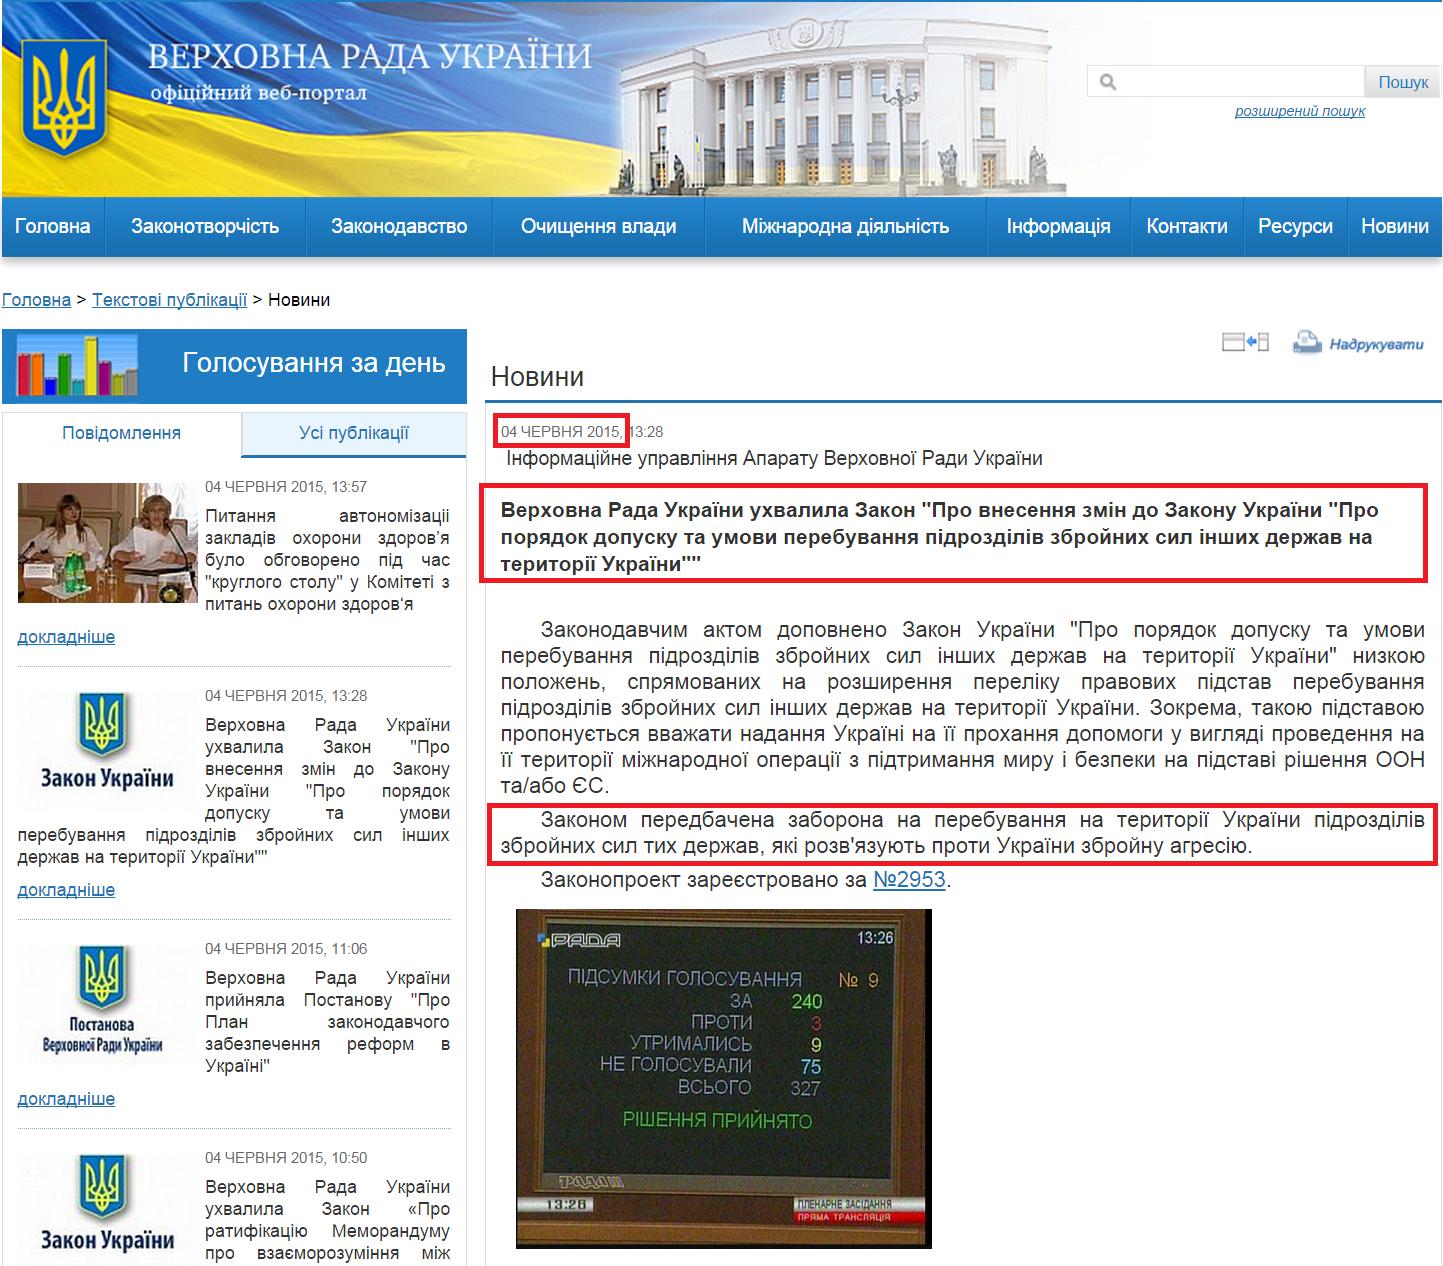 http://iportal.rada.gov.ua/news/Novyny/110903.html